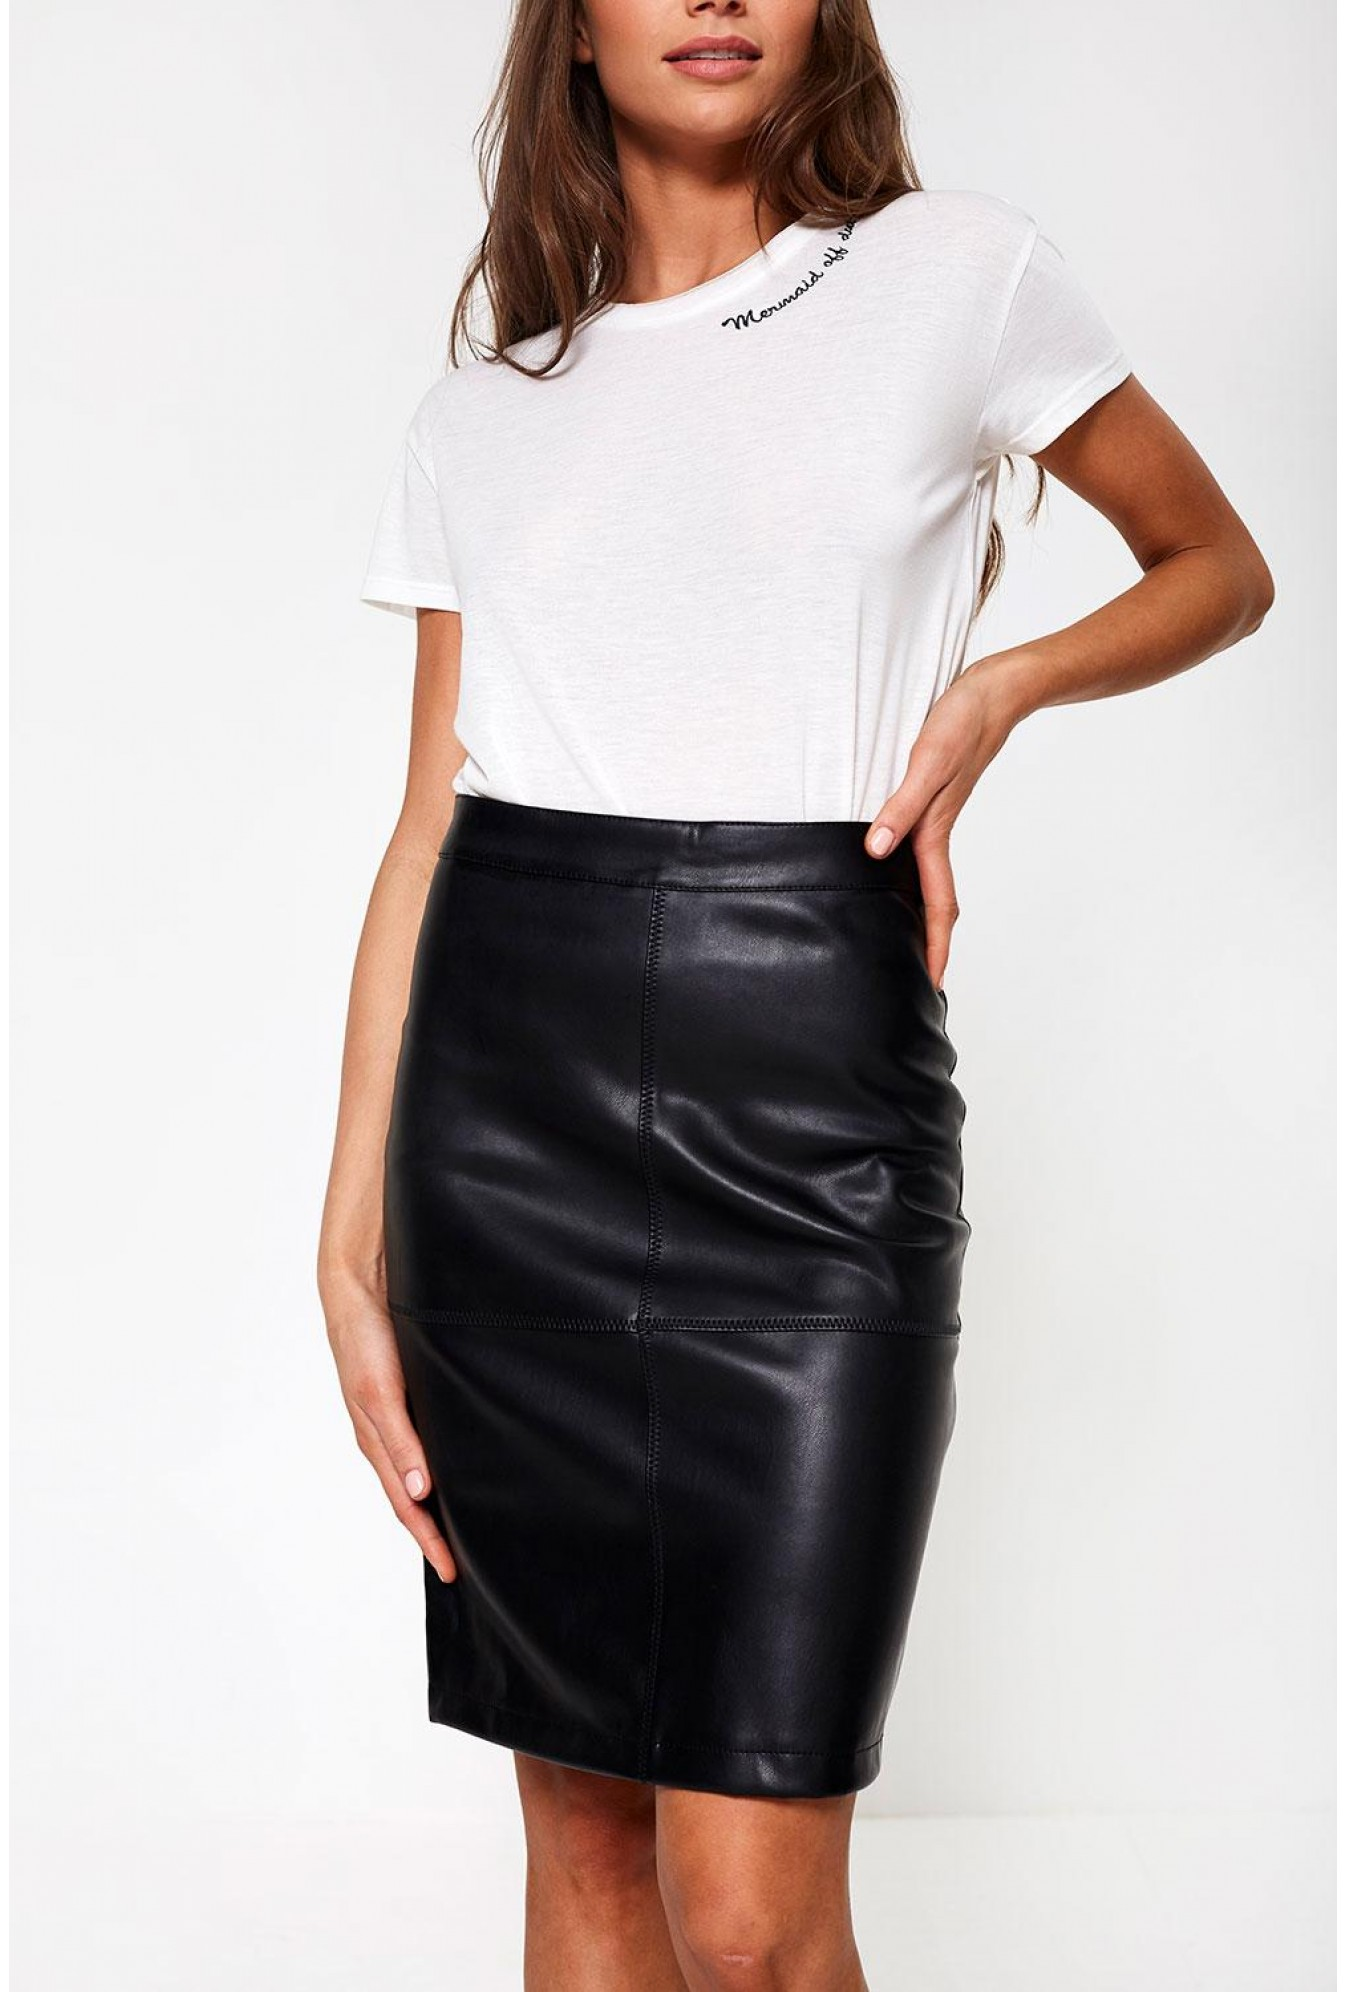 ca93aad681 Vila Mia PU Pencil Skirt in Black | iCLOTHING